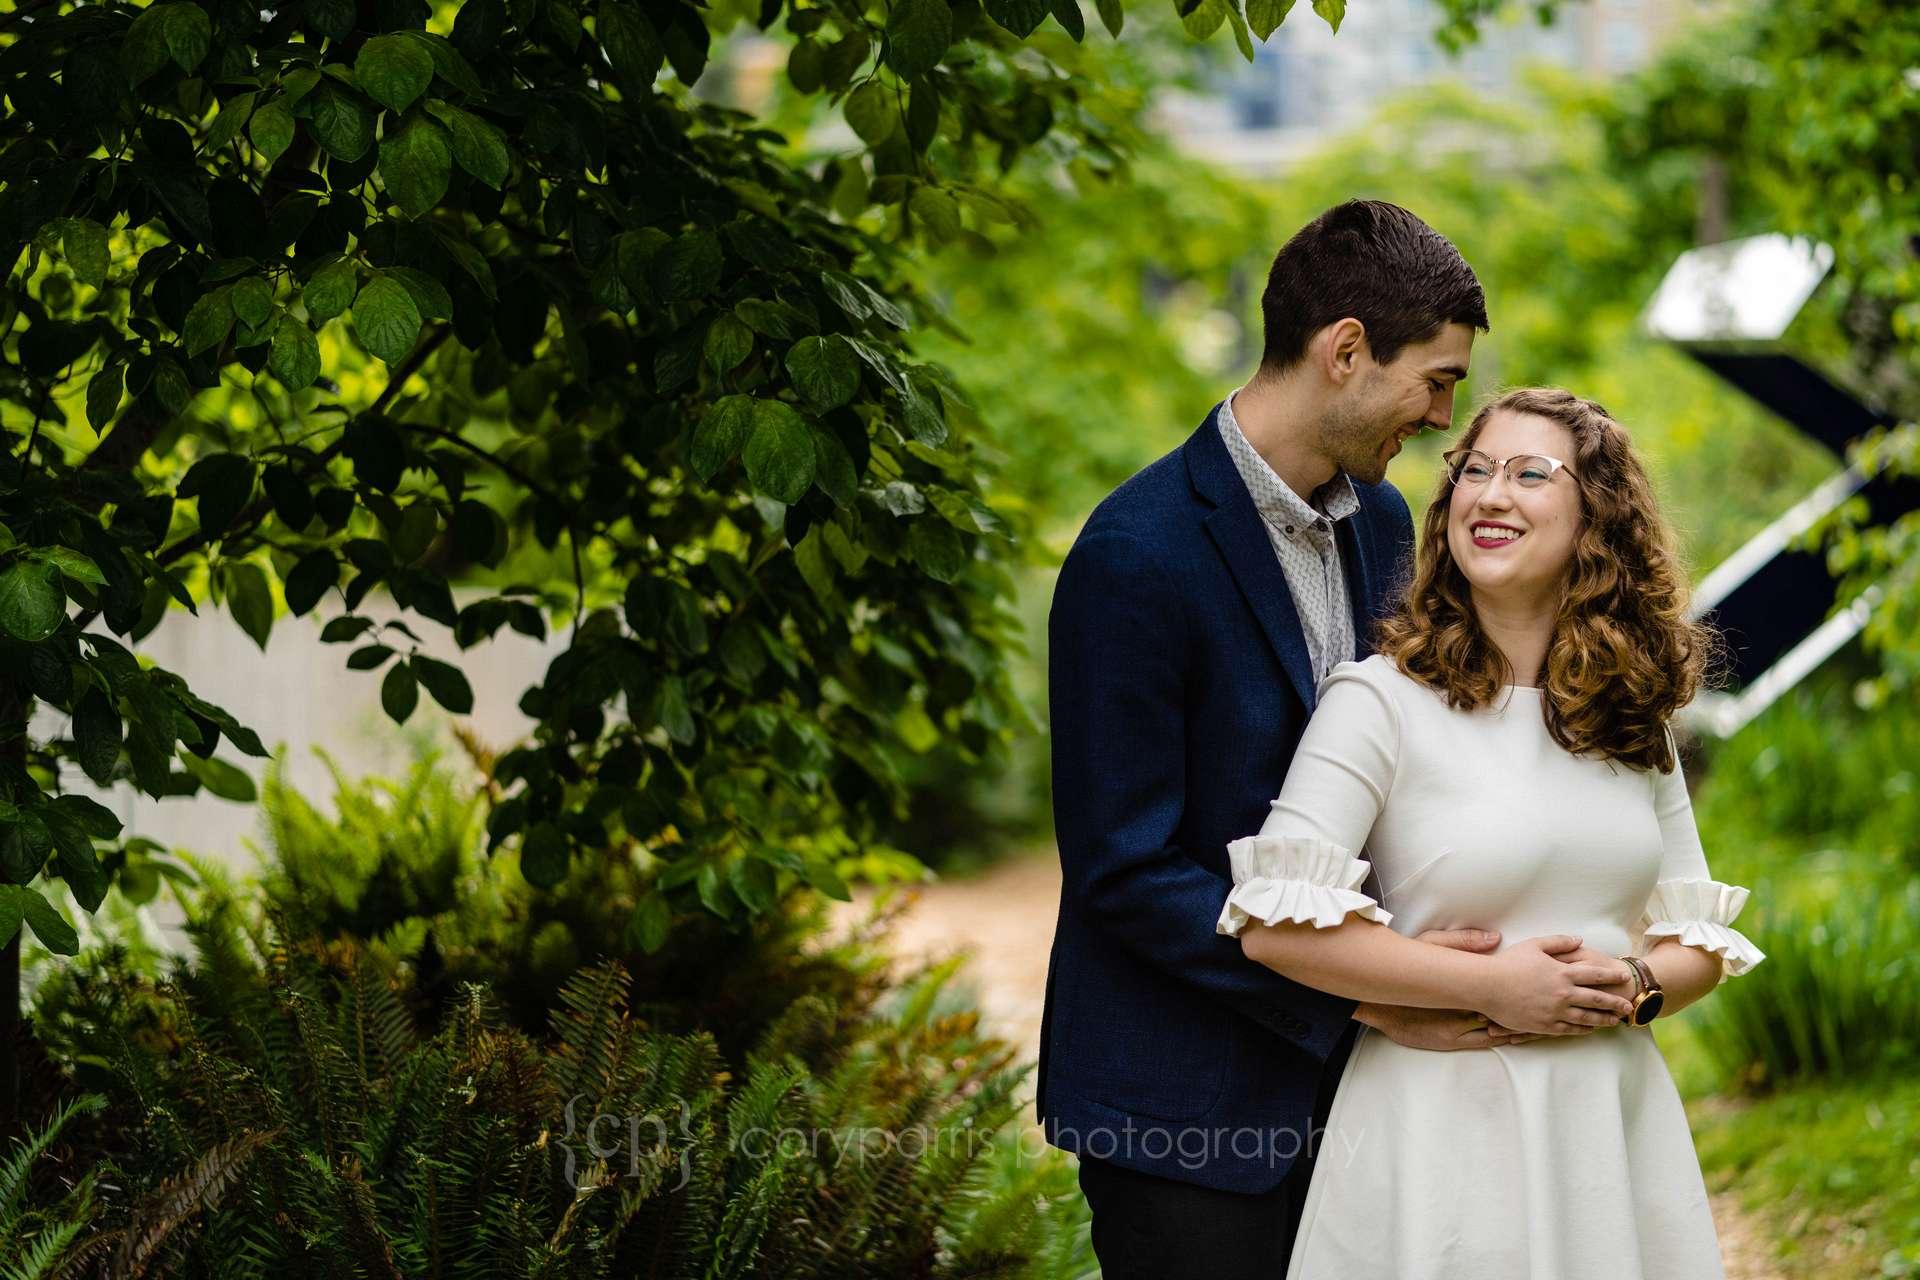 025-Seattle-engagement-portraits.jpg